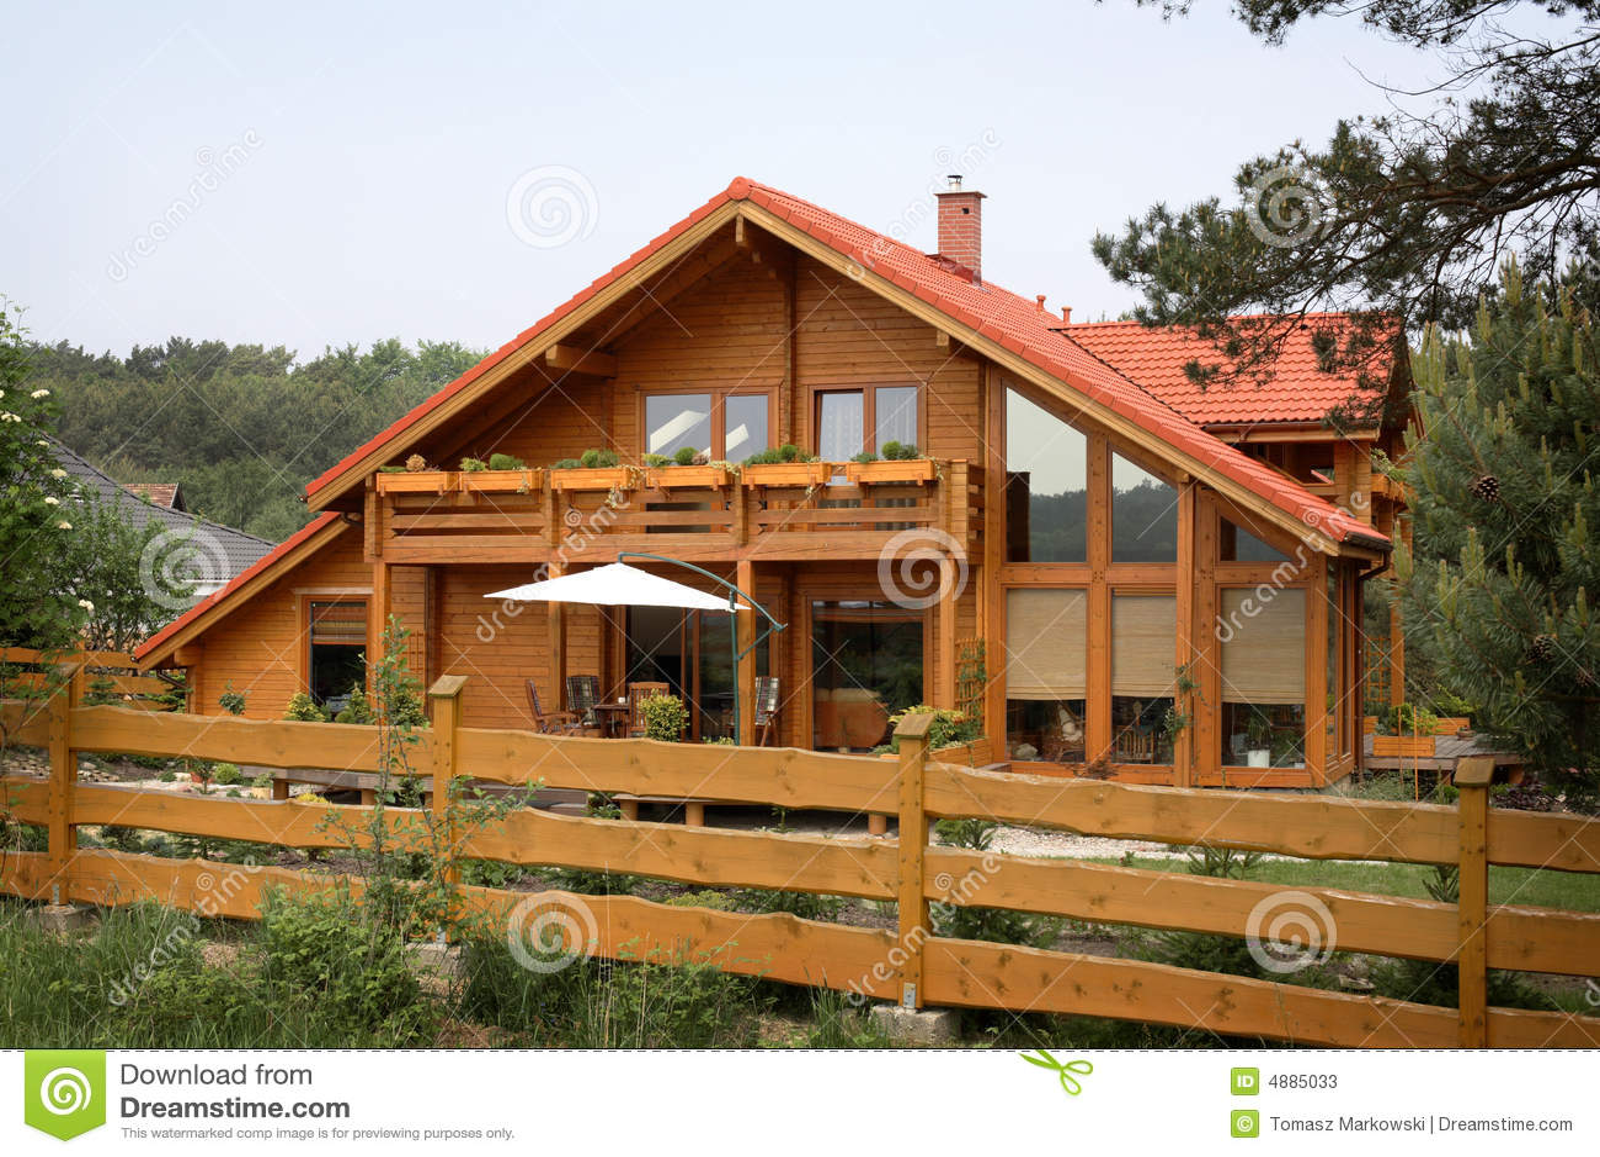 Casa de campo r stica imagem de stock imagem de for Piani di casa vacanza rustica